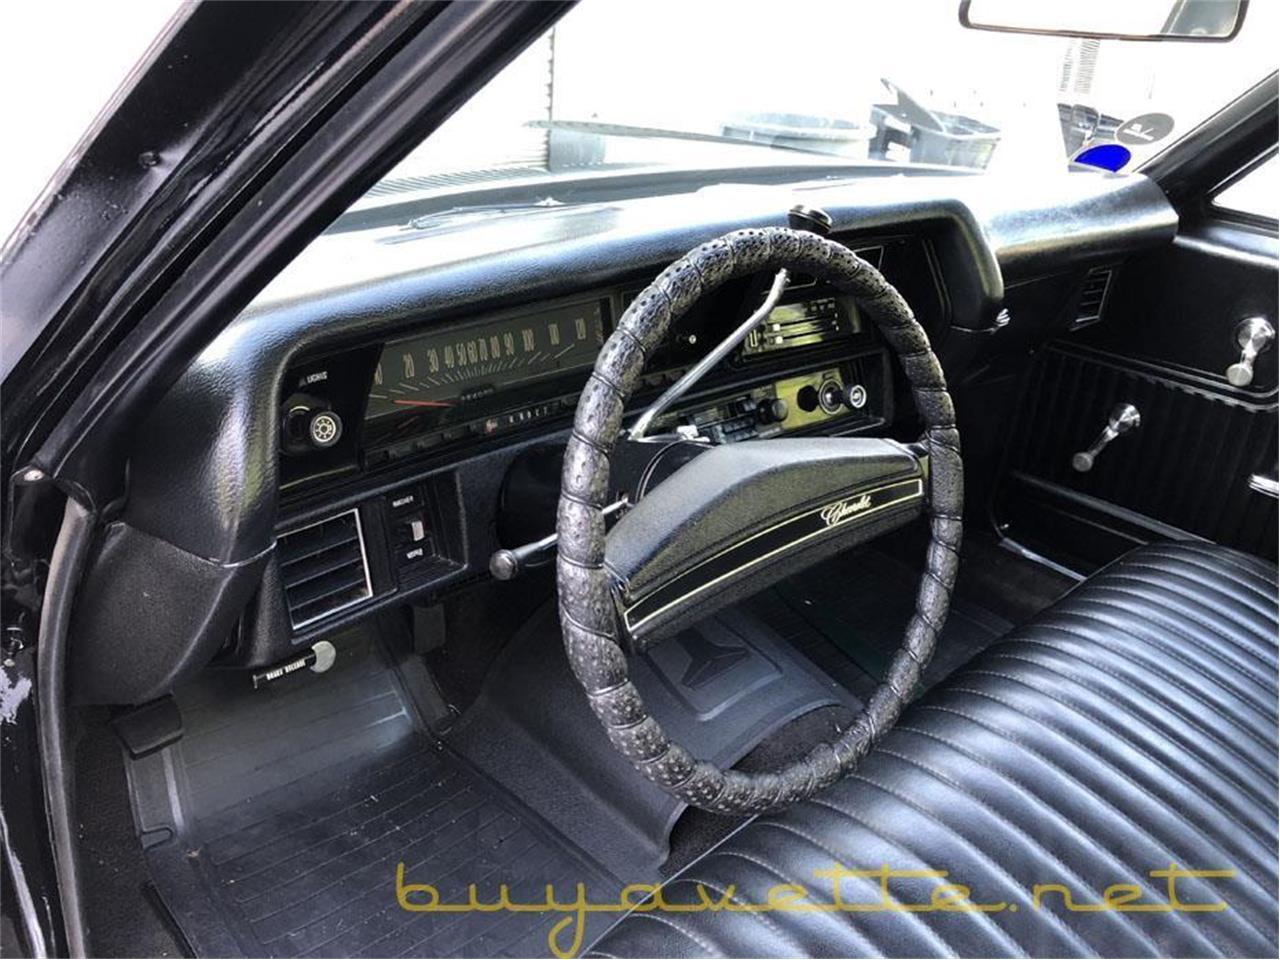 1972 Chevrolet El Camino (CC-1356173) for sale in Atlanta, Georgia